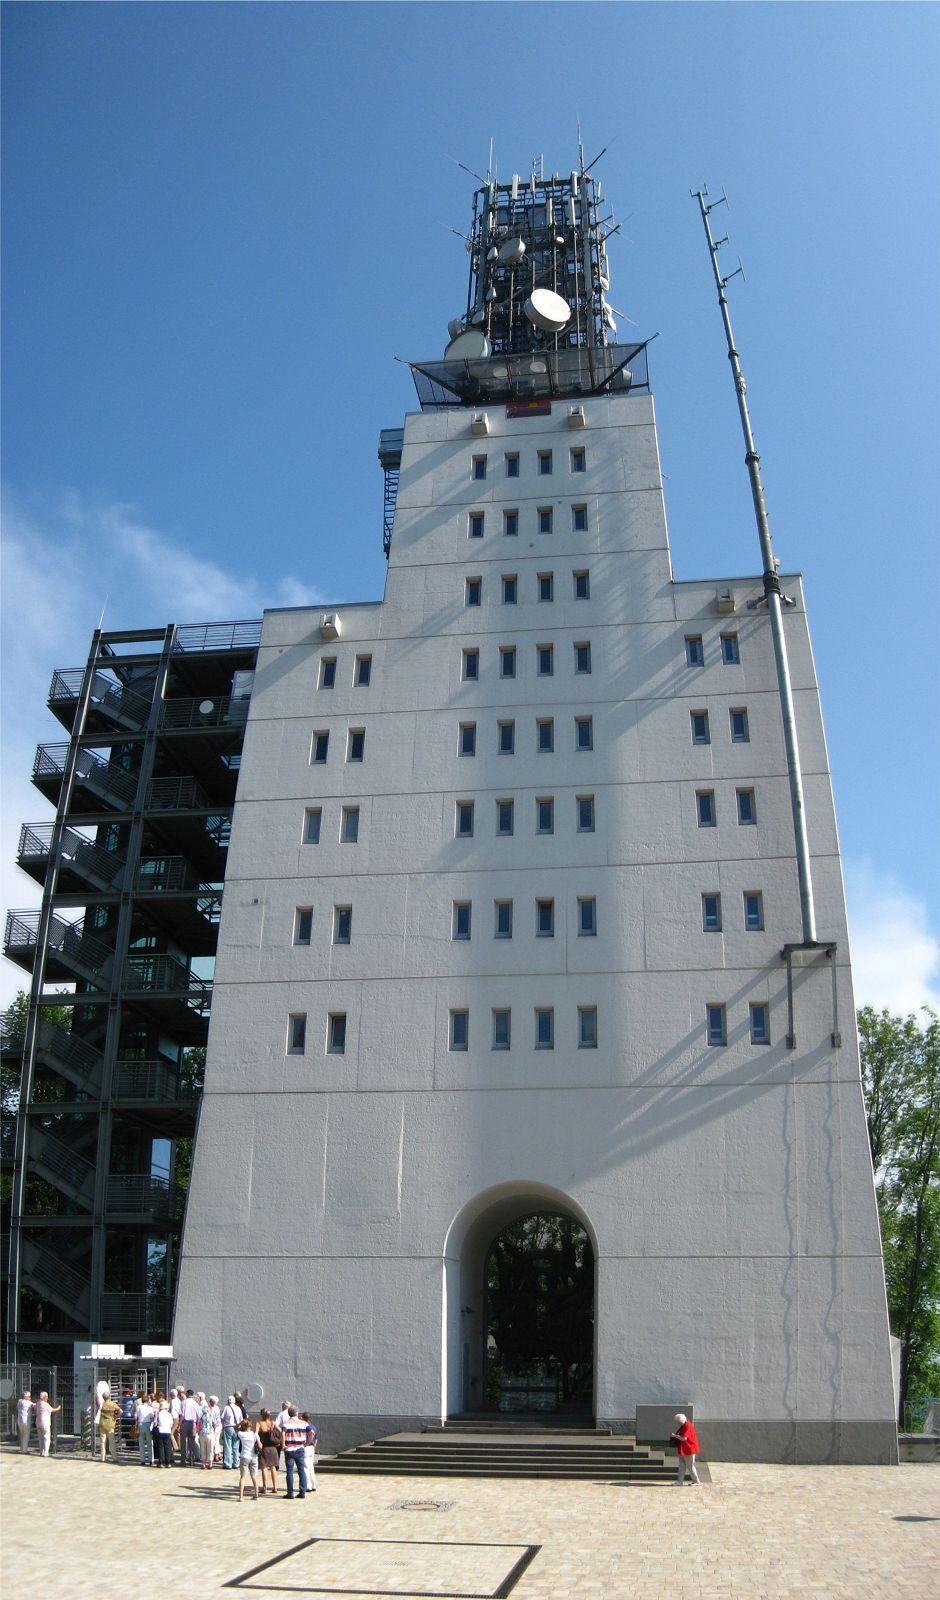 DB0LZ Speckmarschall Schaumbergturm